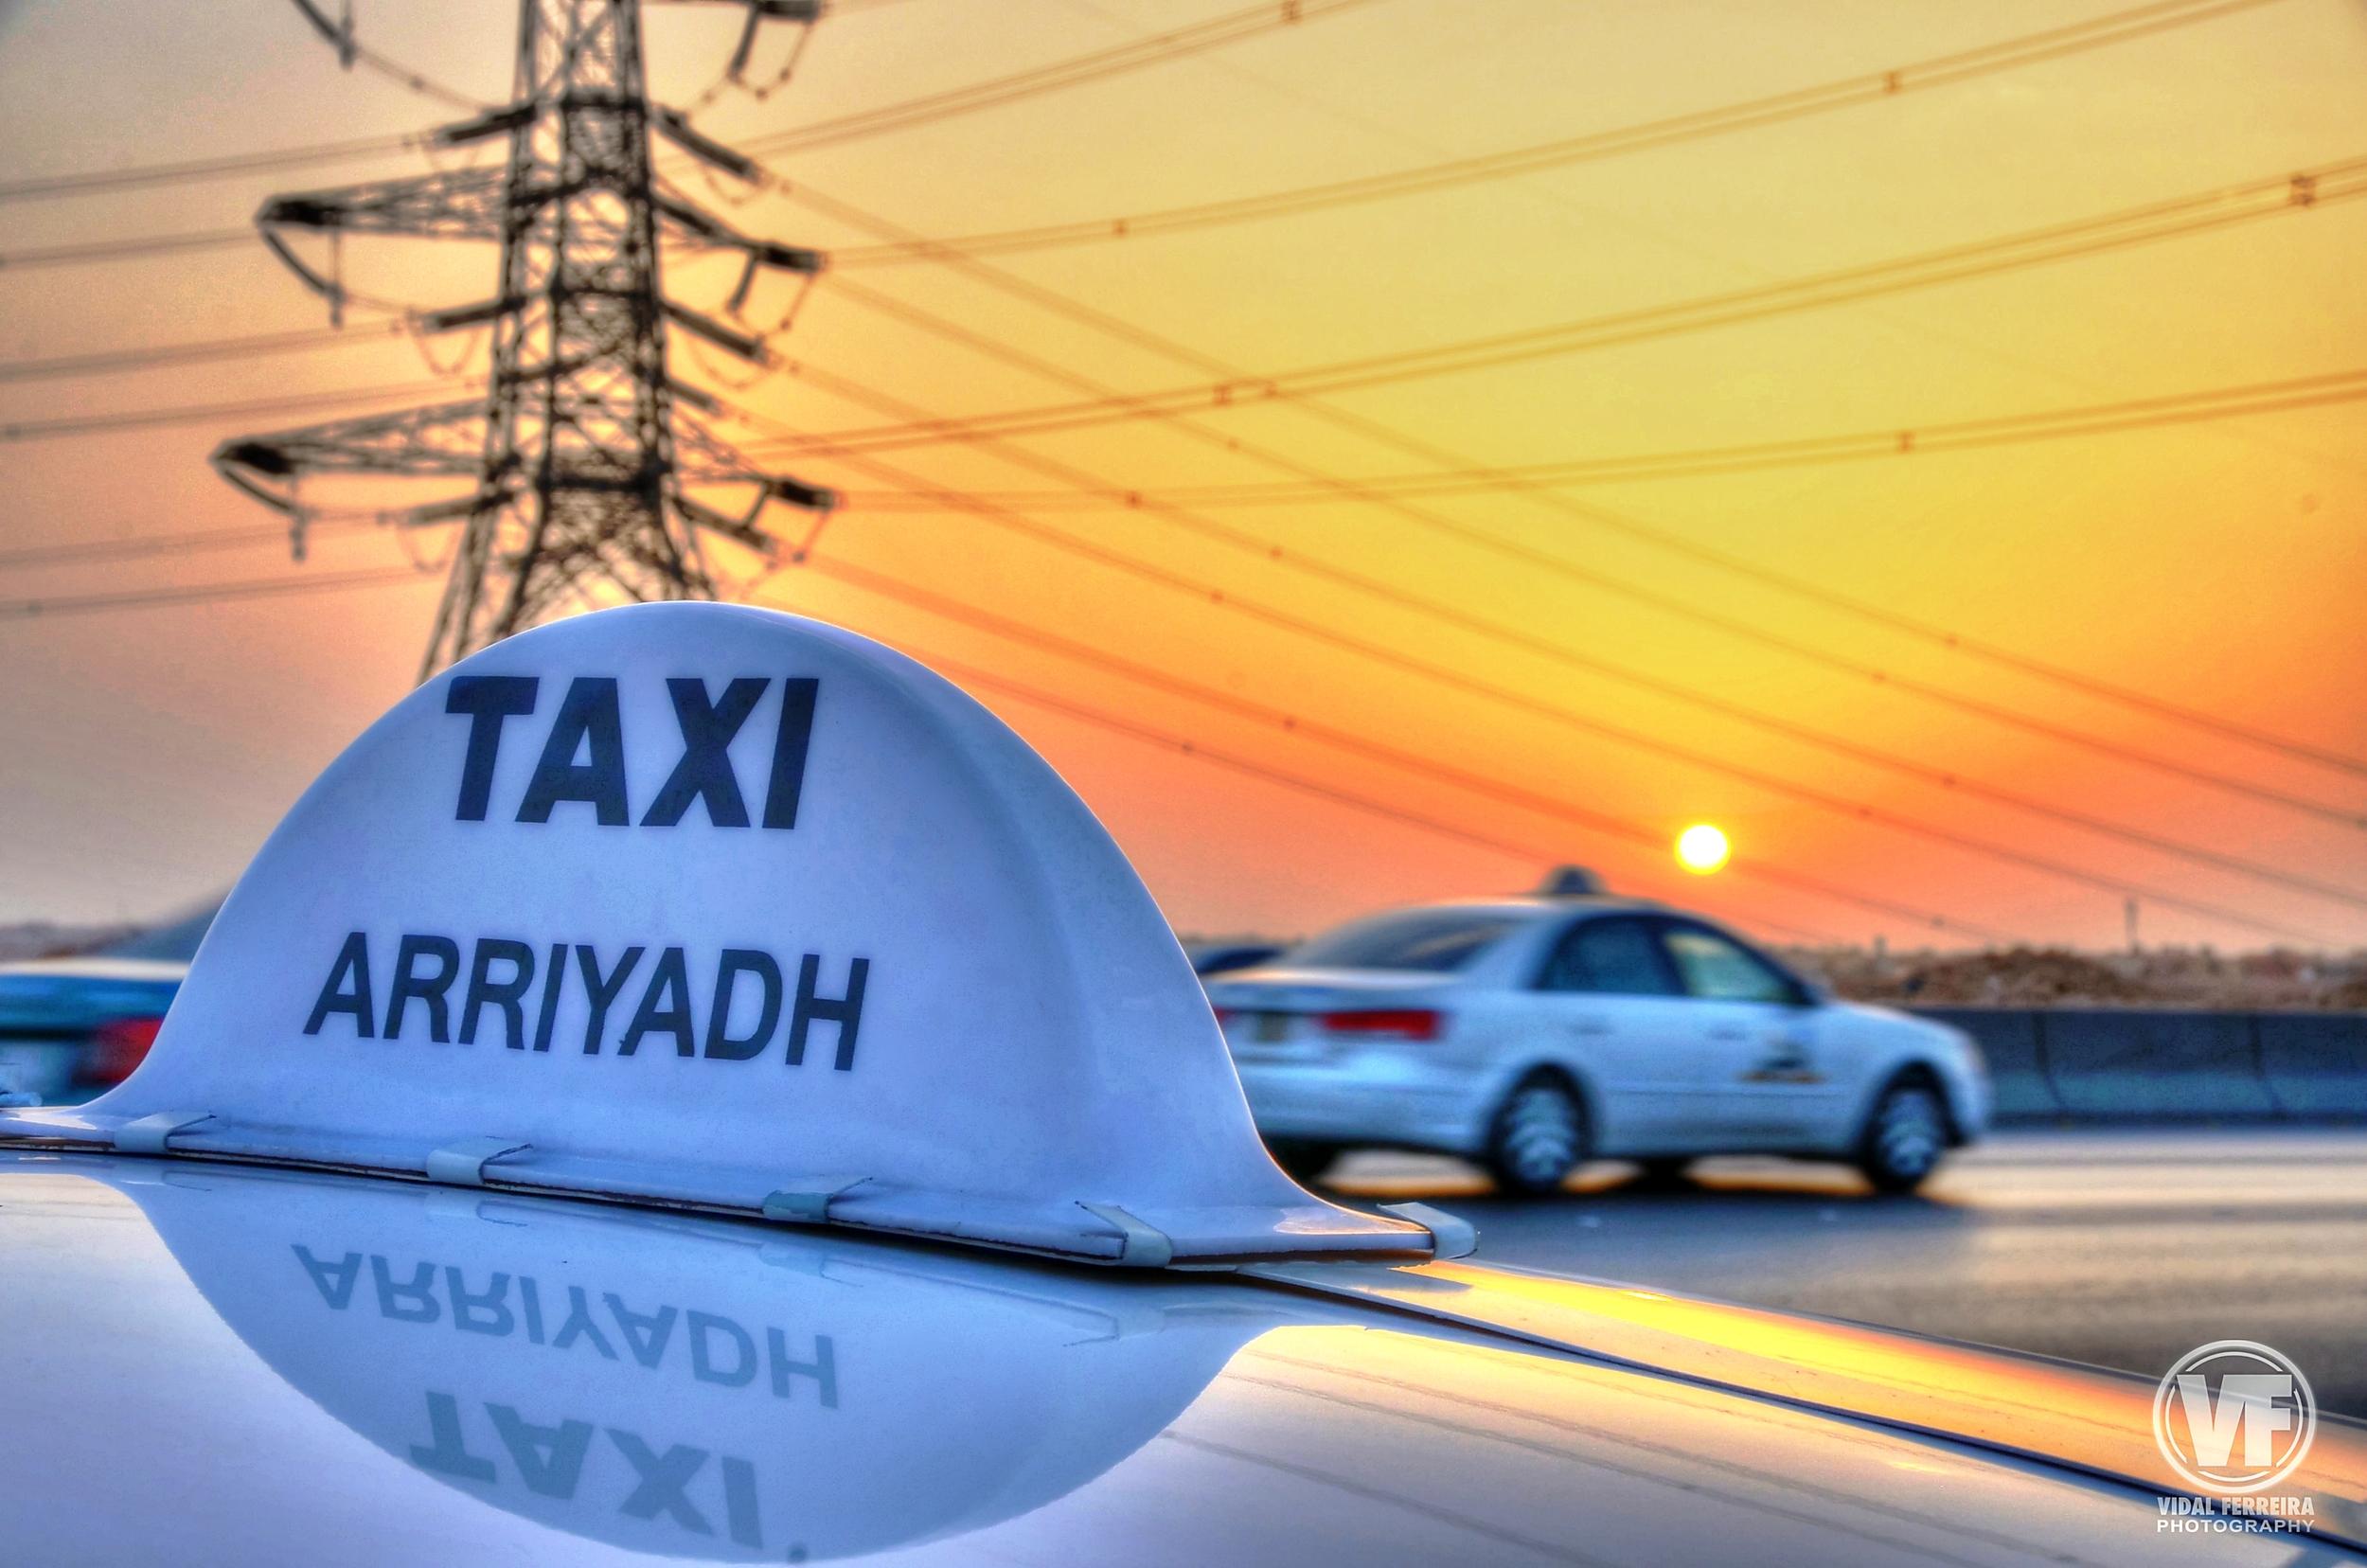 Taxi - Riyadh, Saudi Arabia